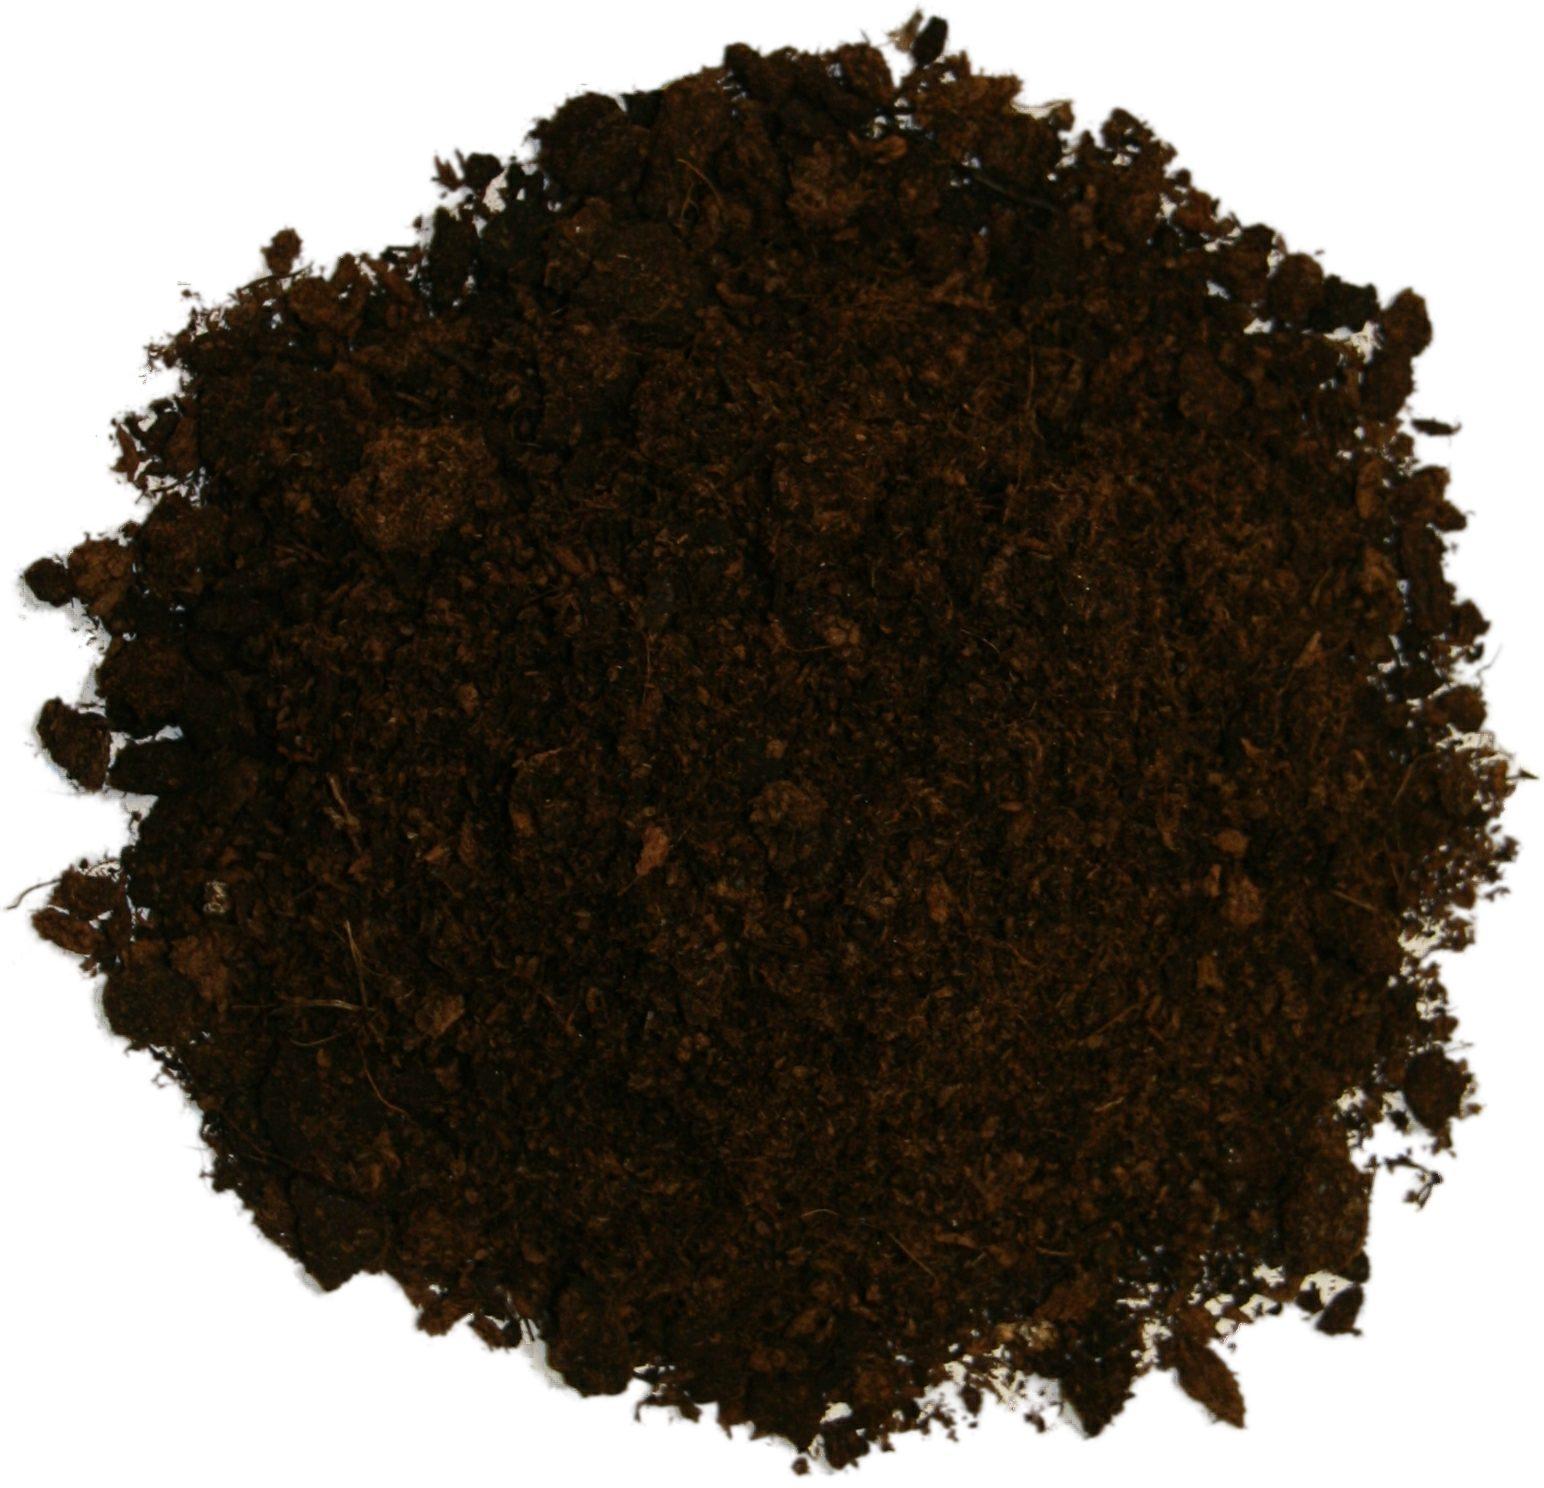 Compost Direct Ltd - Compost Direct